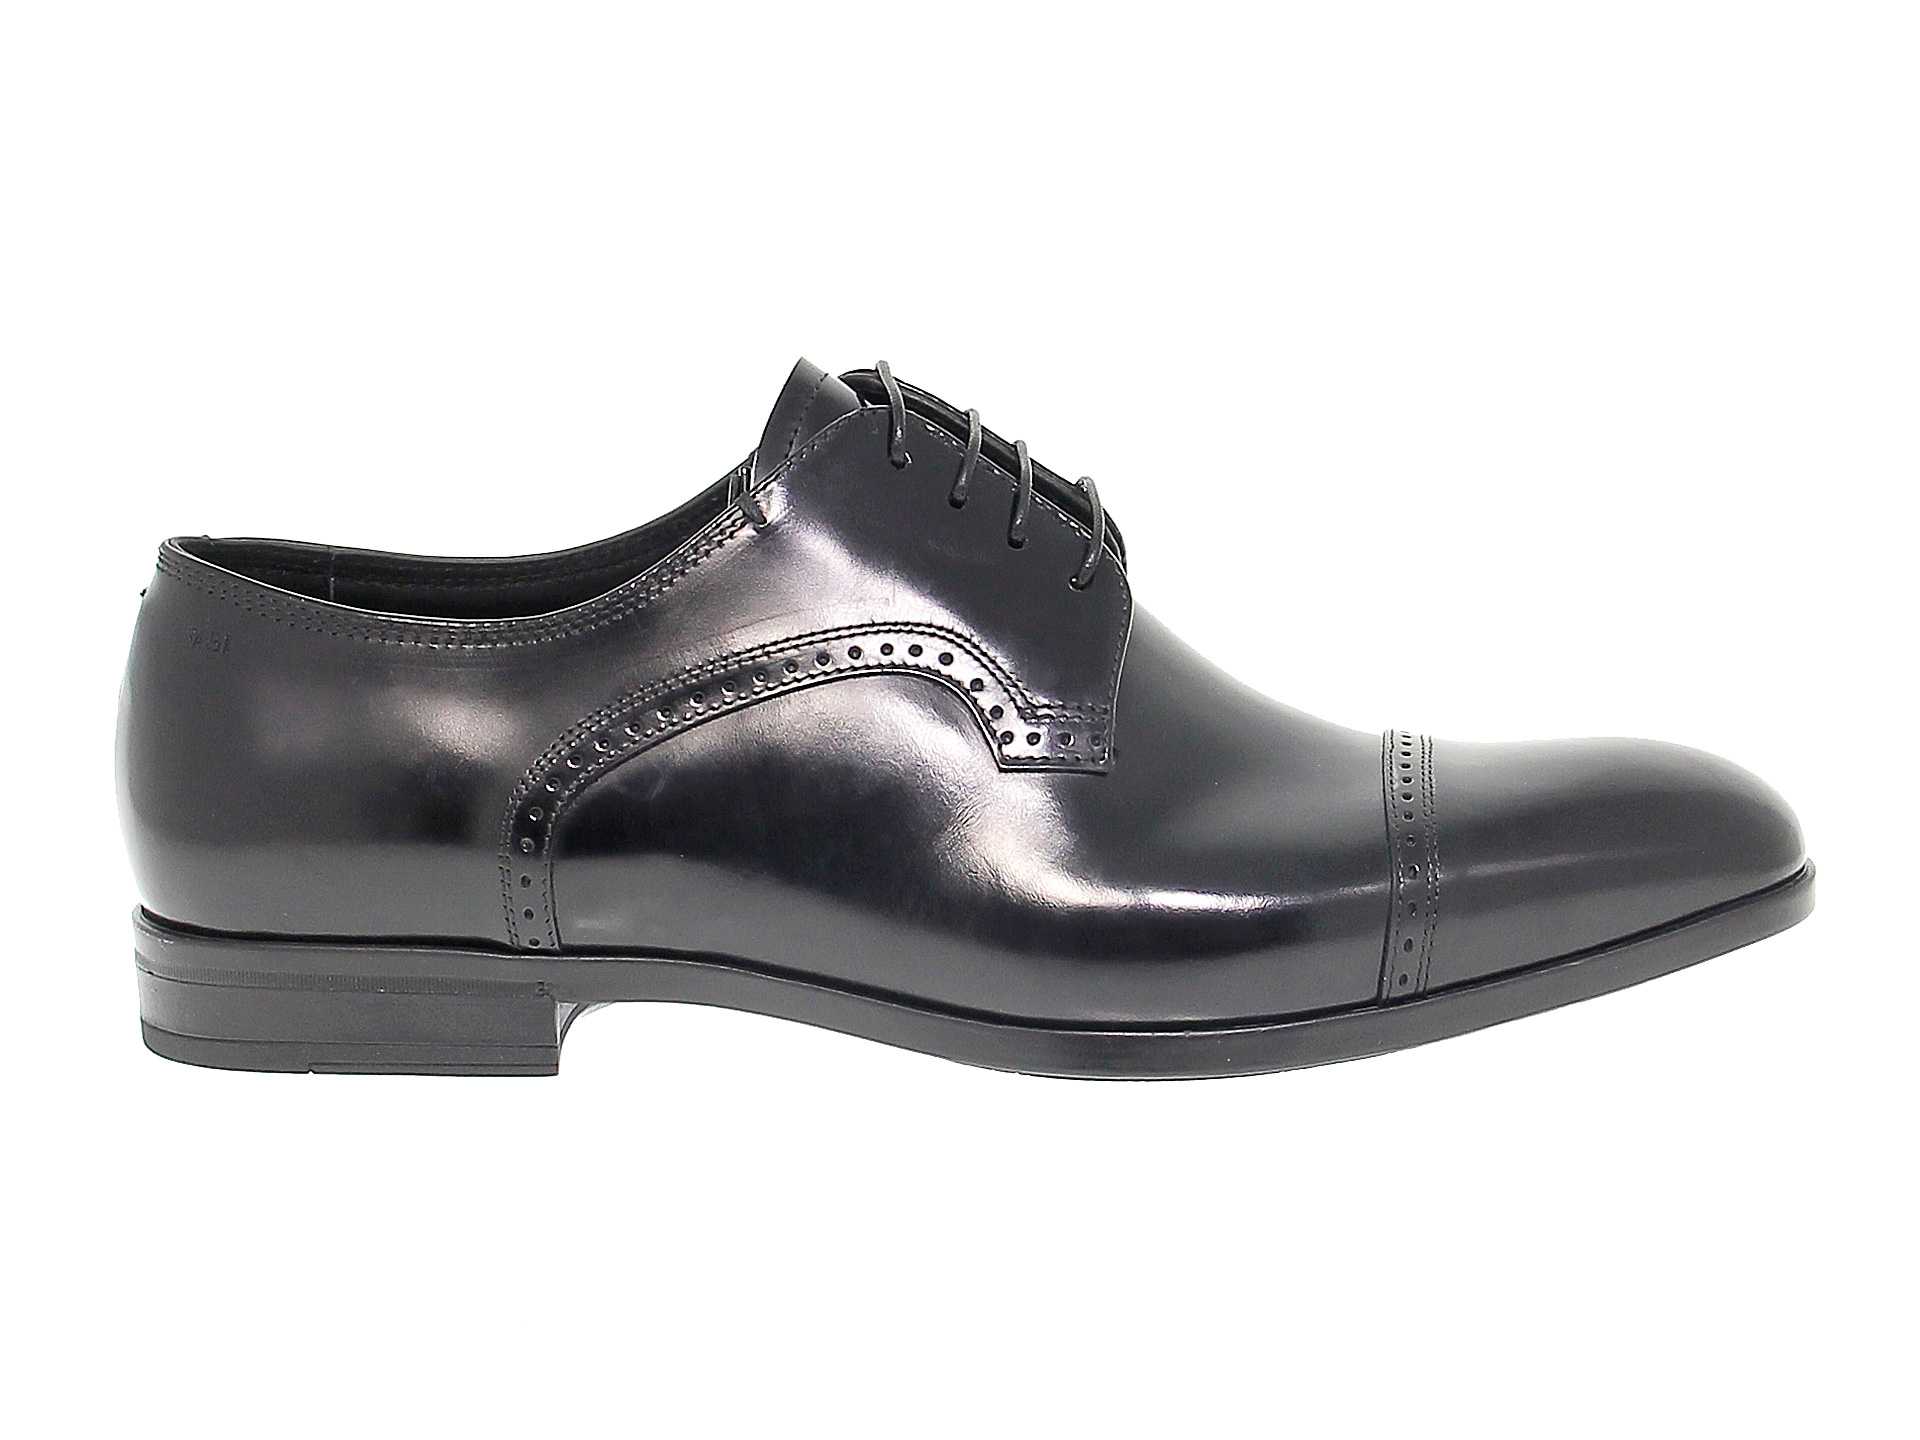 À Chaussures Fabi Peau En Lacets Firenze UpVLqMjzGS